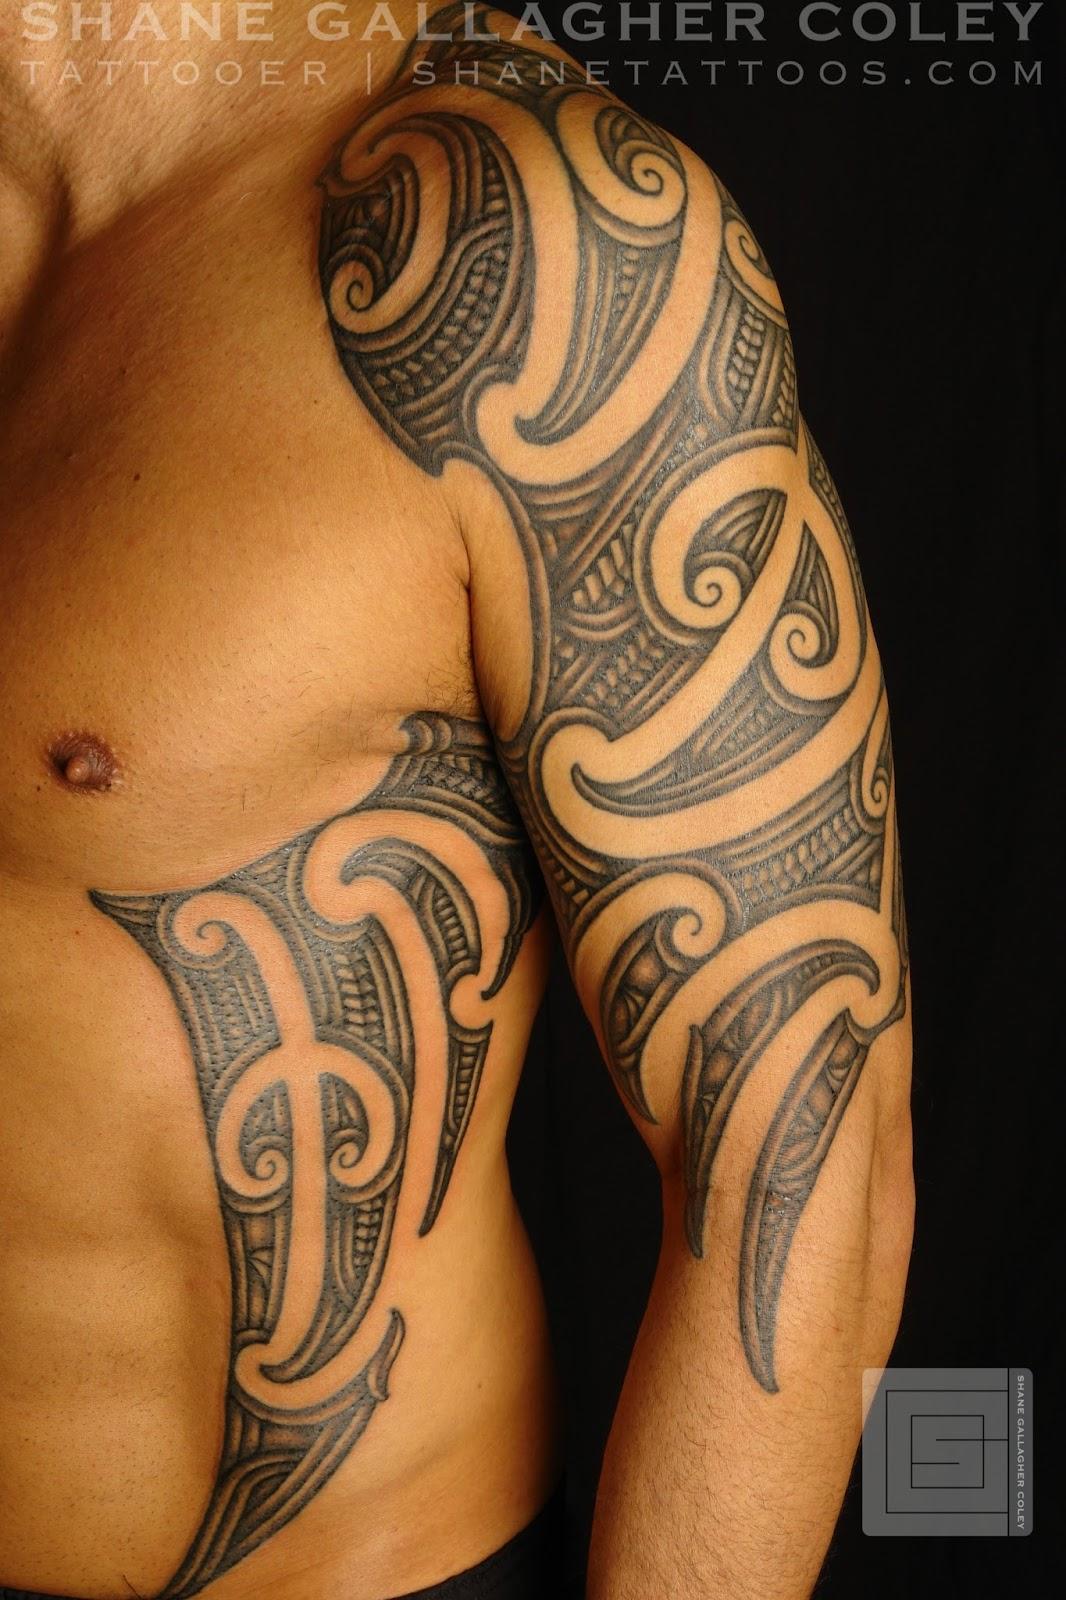 maori polynesian tattoo maori sleeve and side tattoo ta moko. Black Bedroom Furniture Sets. Home Design Ideas